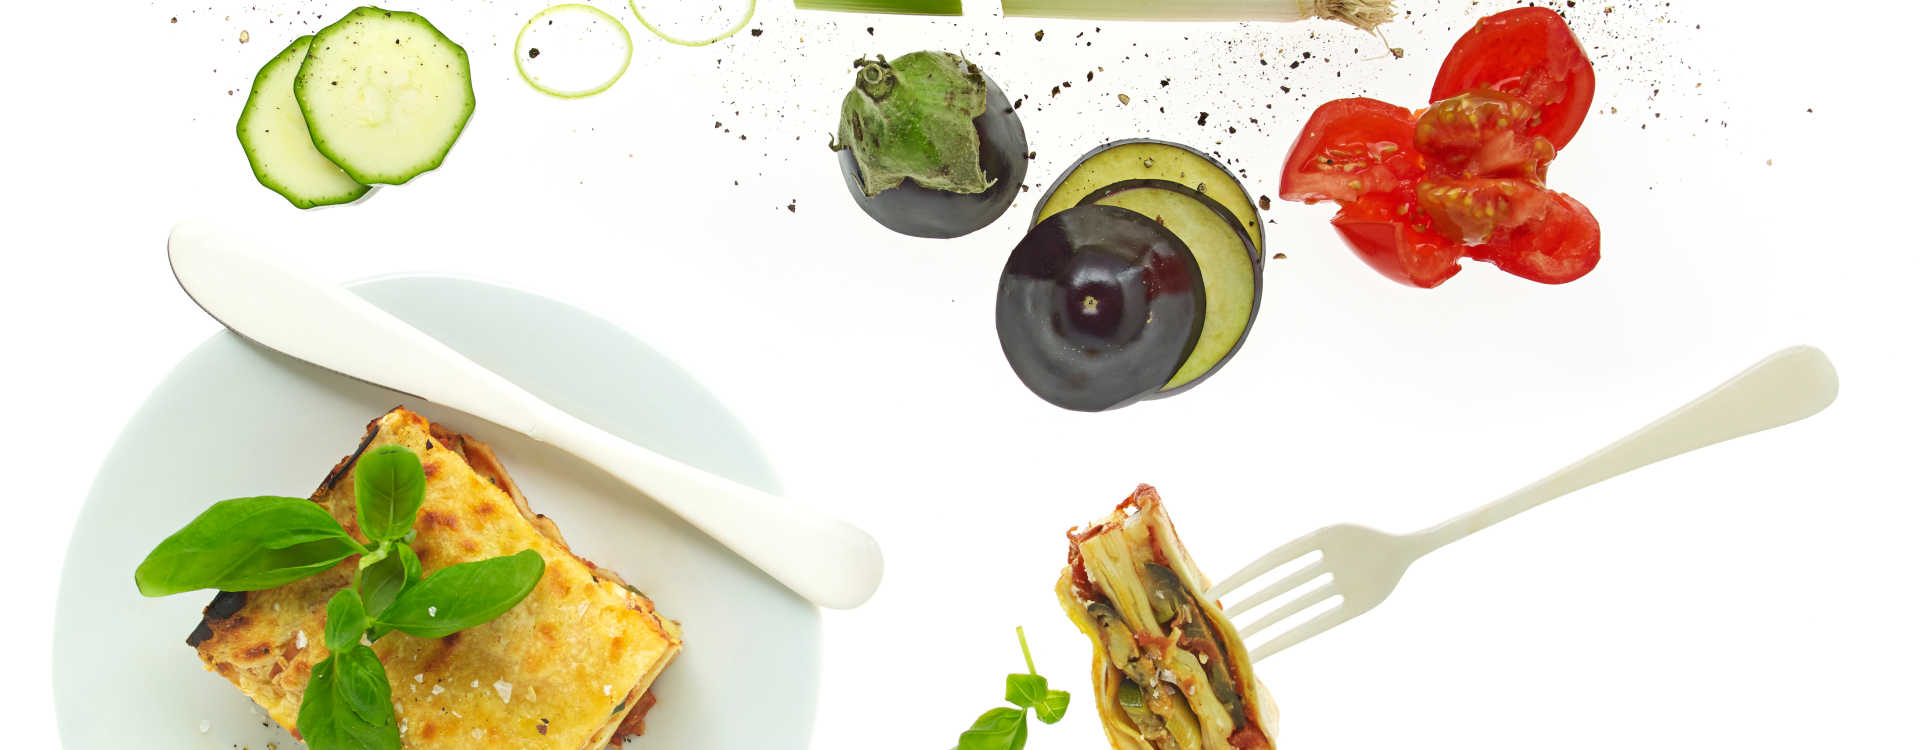 Vegetarlasagne med aubergine og kremostsaus